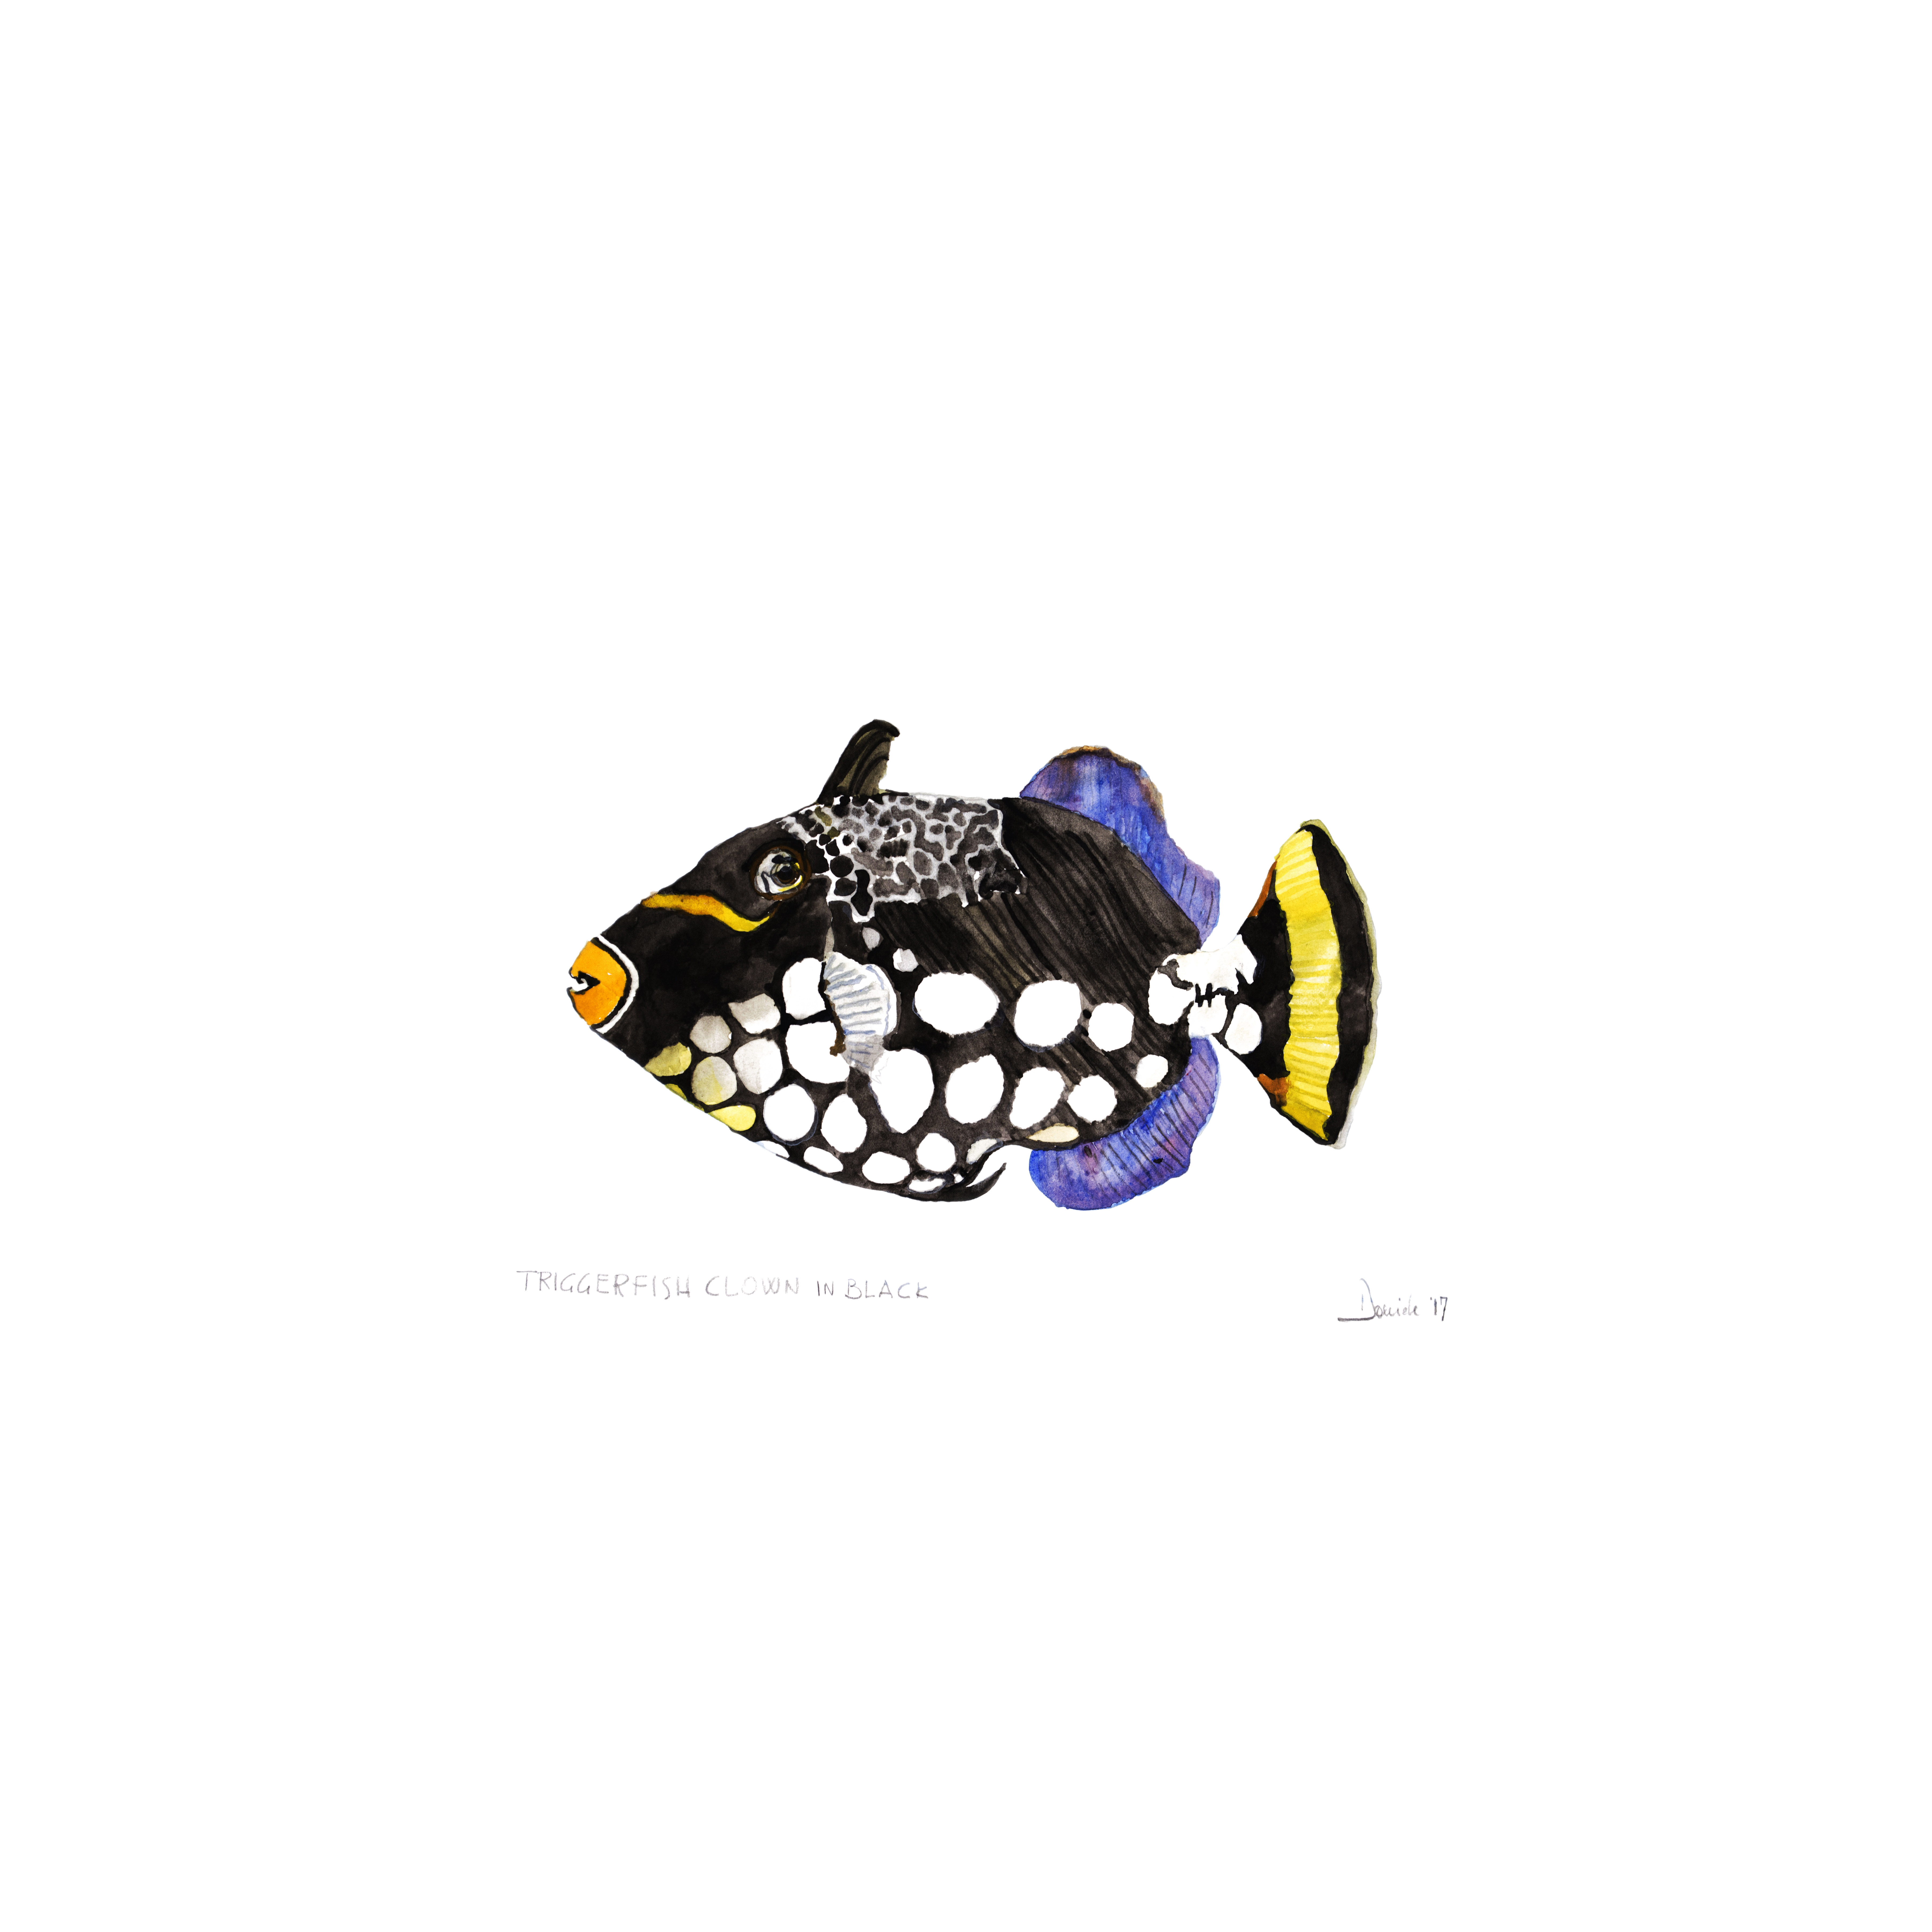 Triggerfish Clown in Black, 2018